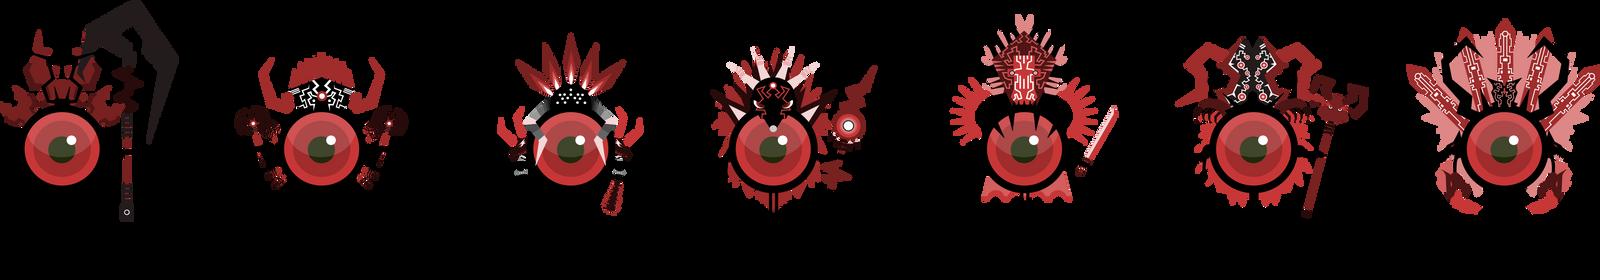 Eyeball classes by NightBladeN